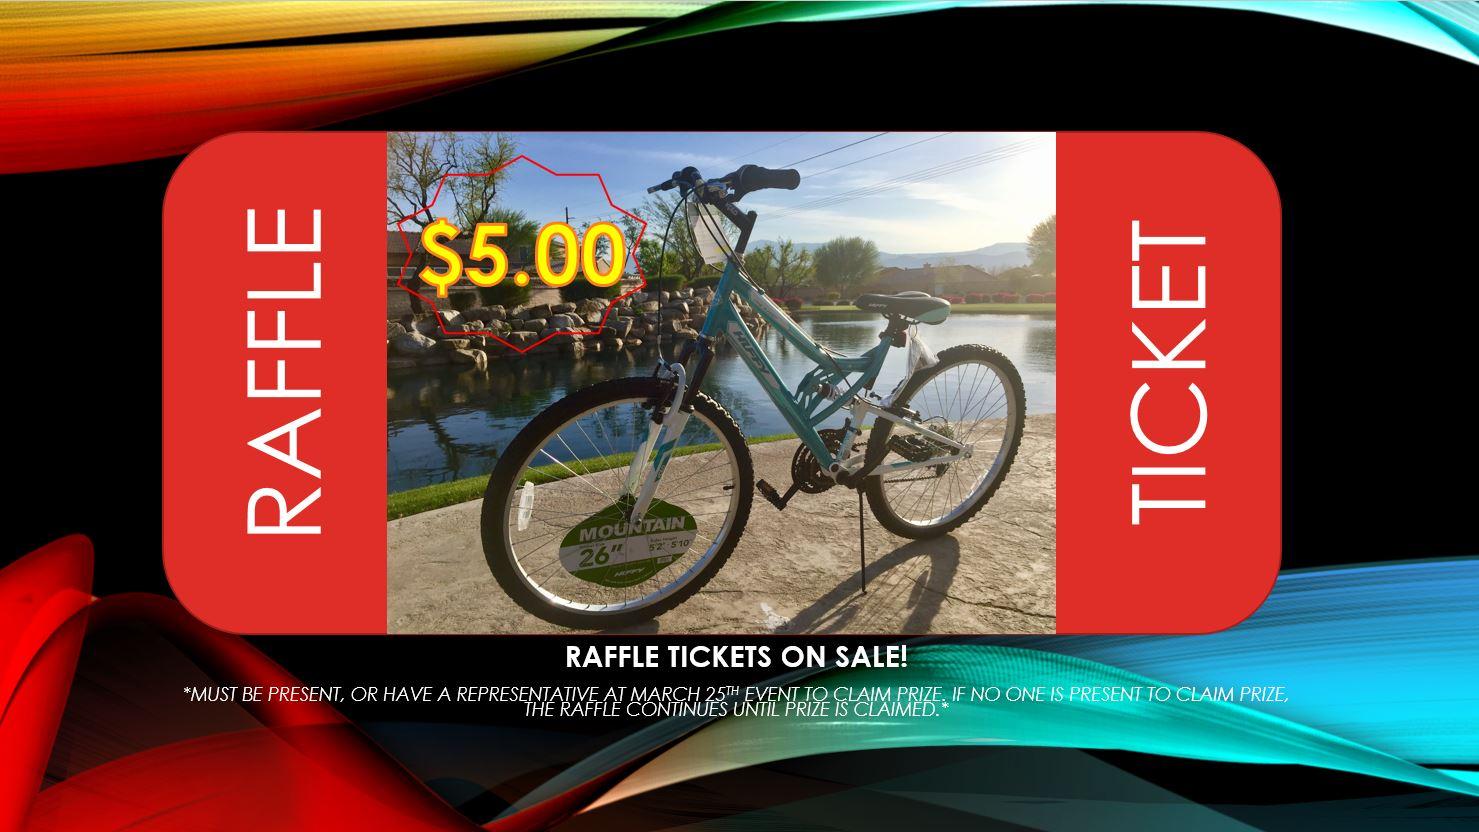 Mountain Bike Raffle Ticket — Stacy M Estrada